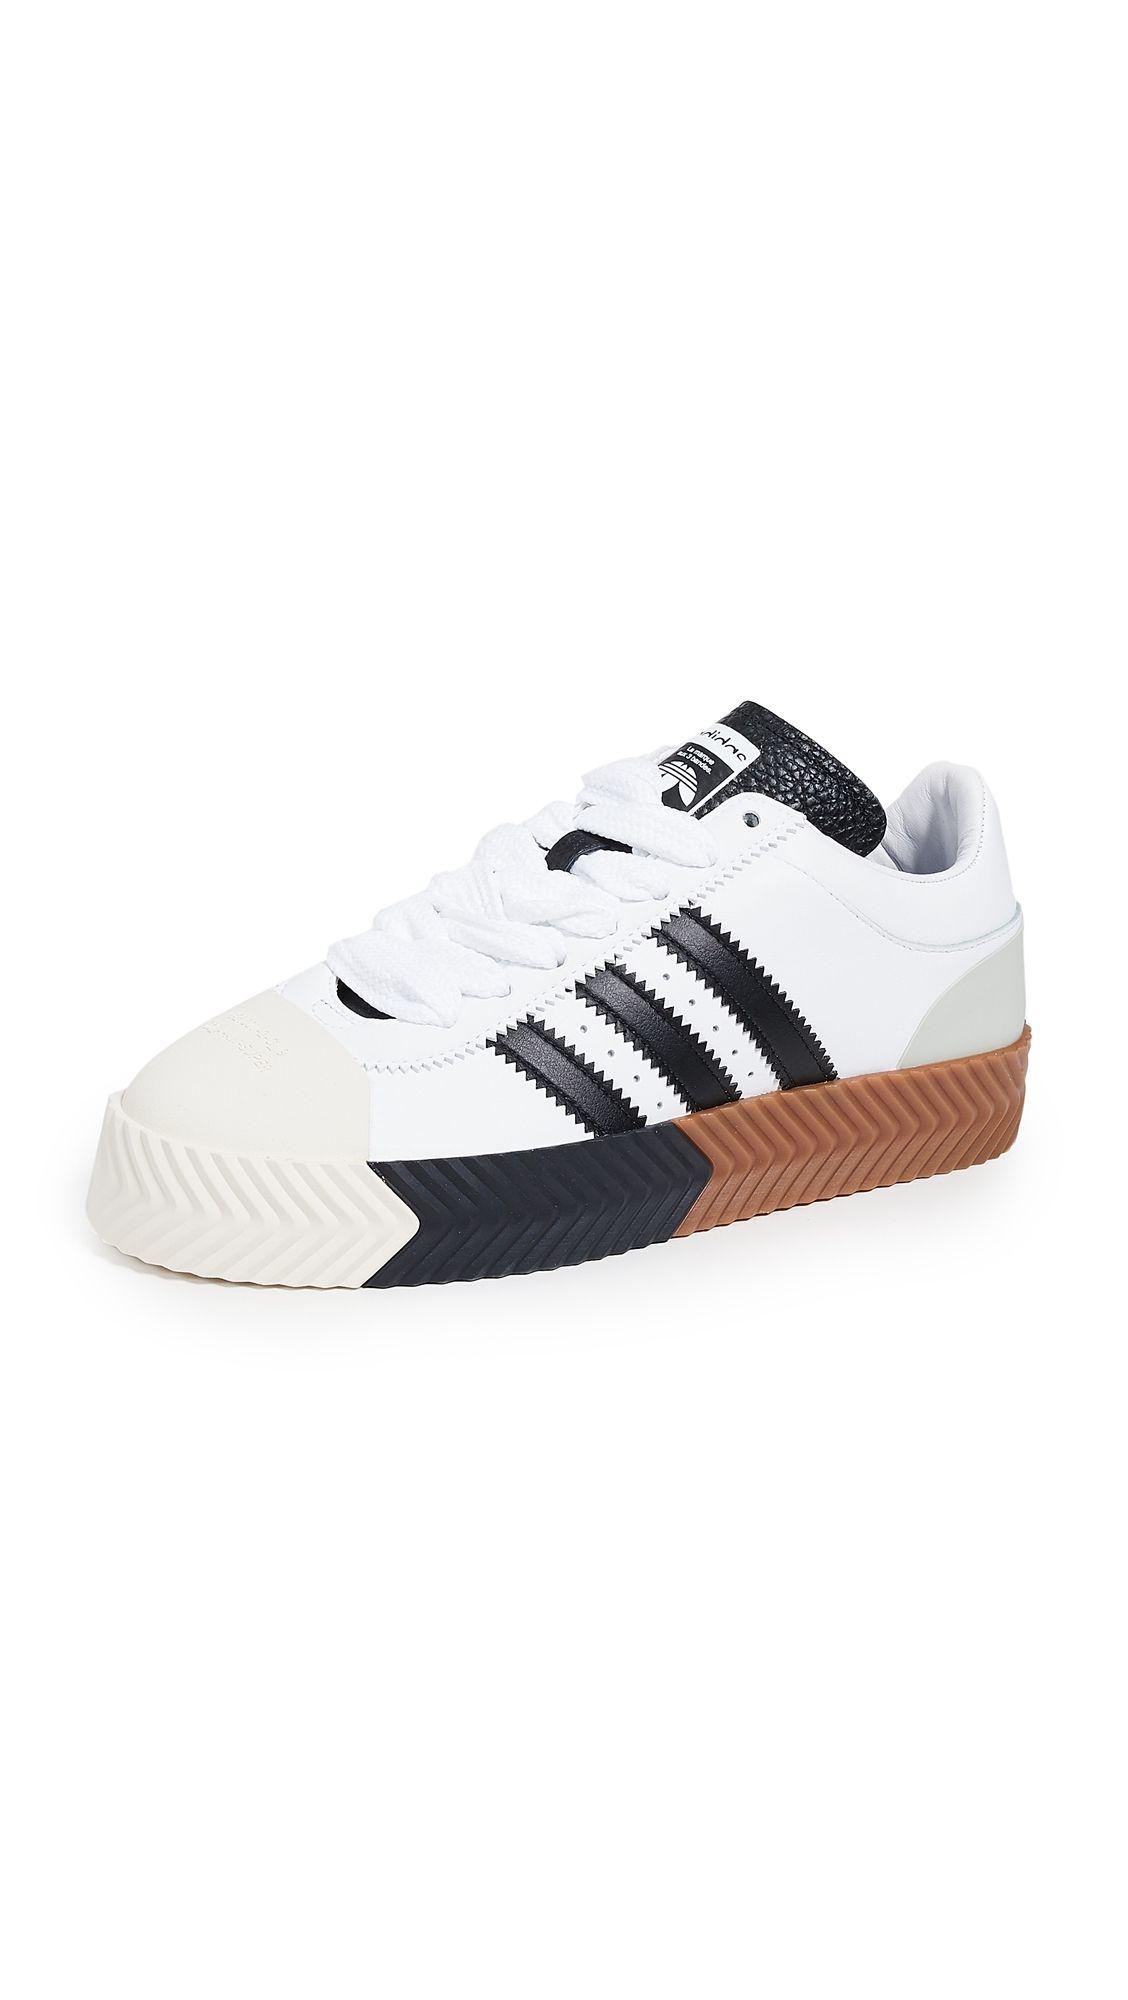 2fc0504d5d87 ADIDAS ORIGINALS BY ALEXANDER WANG AW SKATE SUPER SNEAKERS.   adidasoriginalsbyalexanderwang  shoes